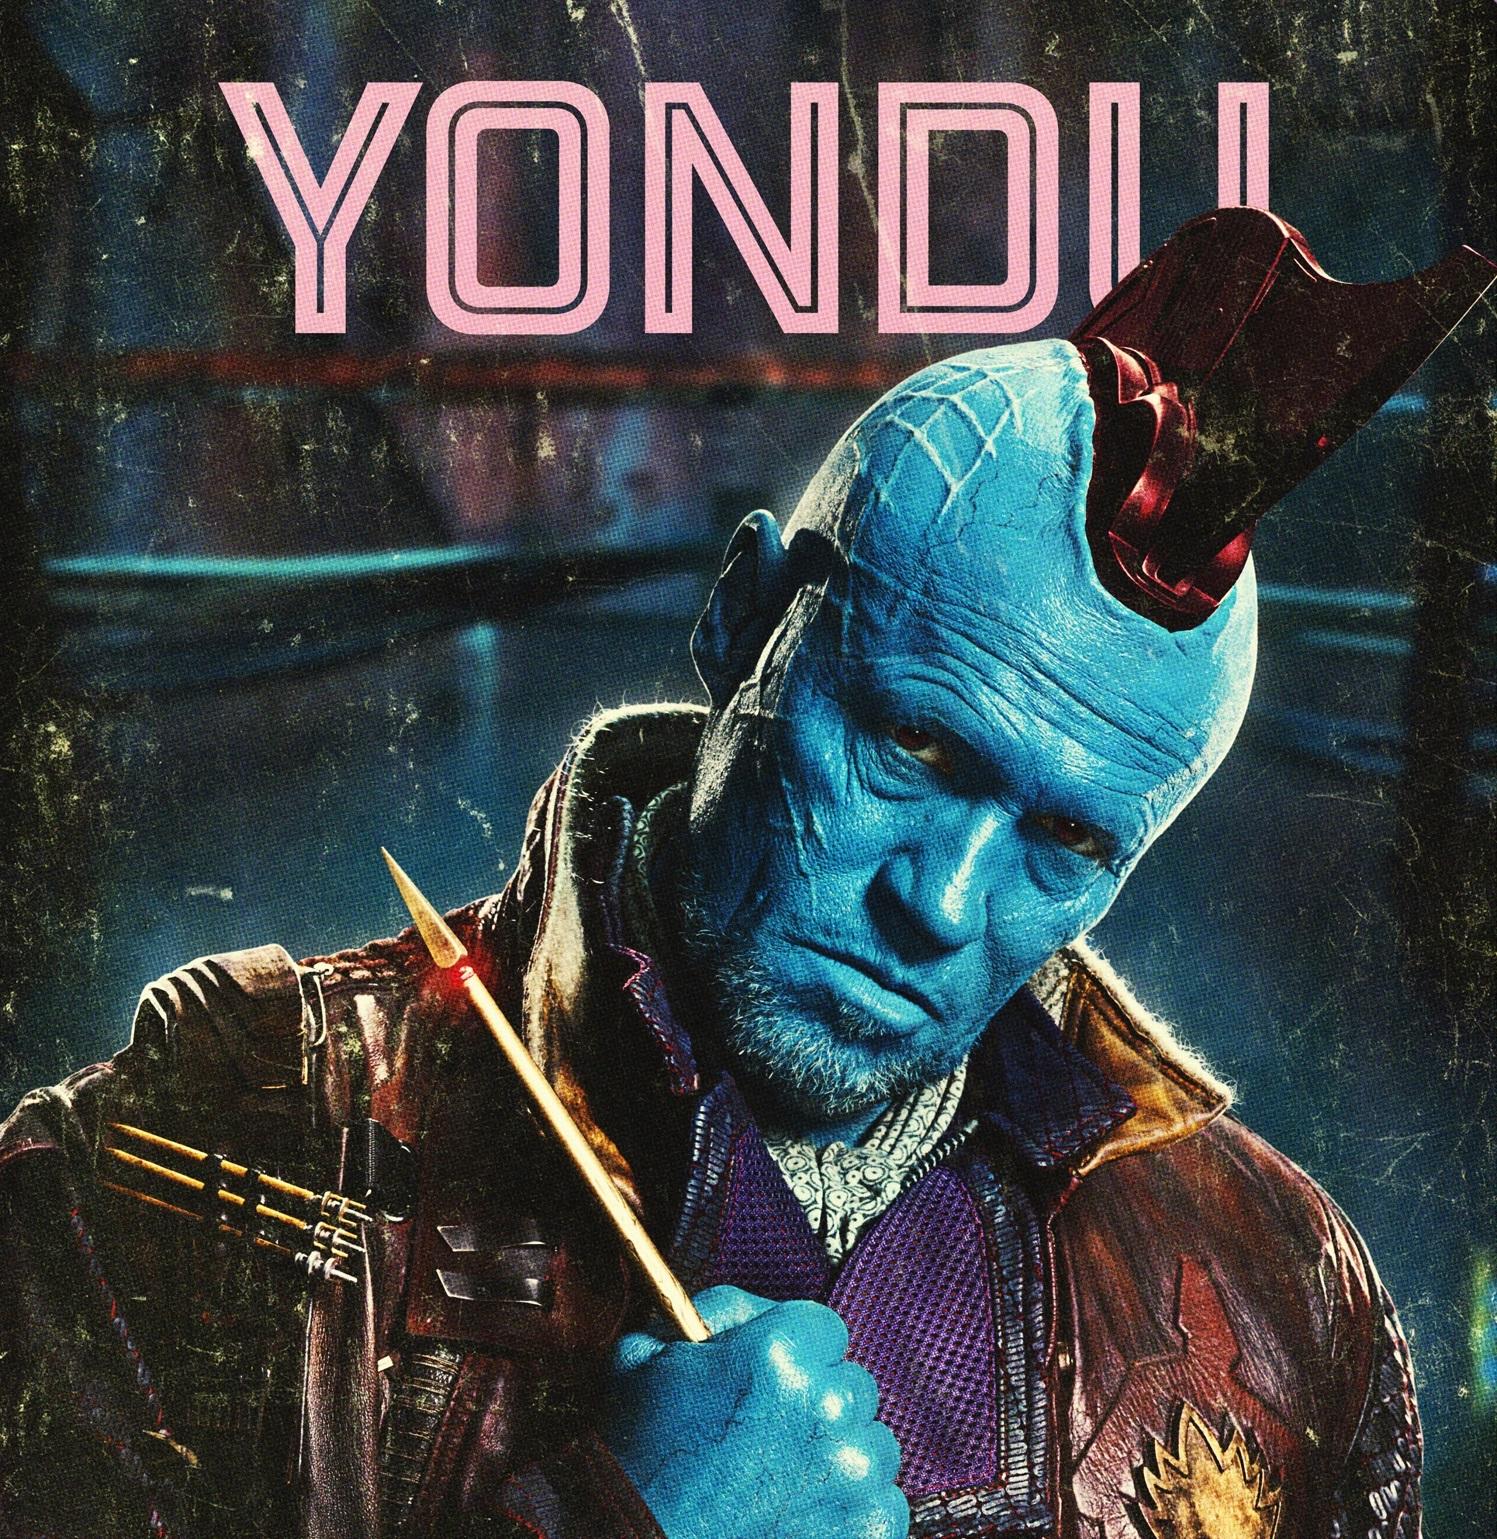 Personajes de Guardianes de la Galaxia (Yondu)